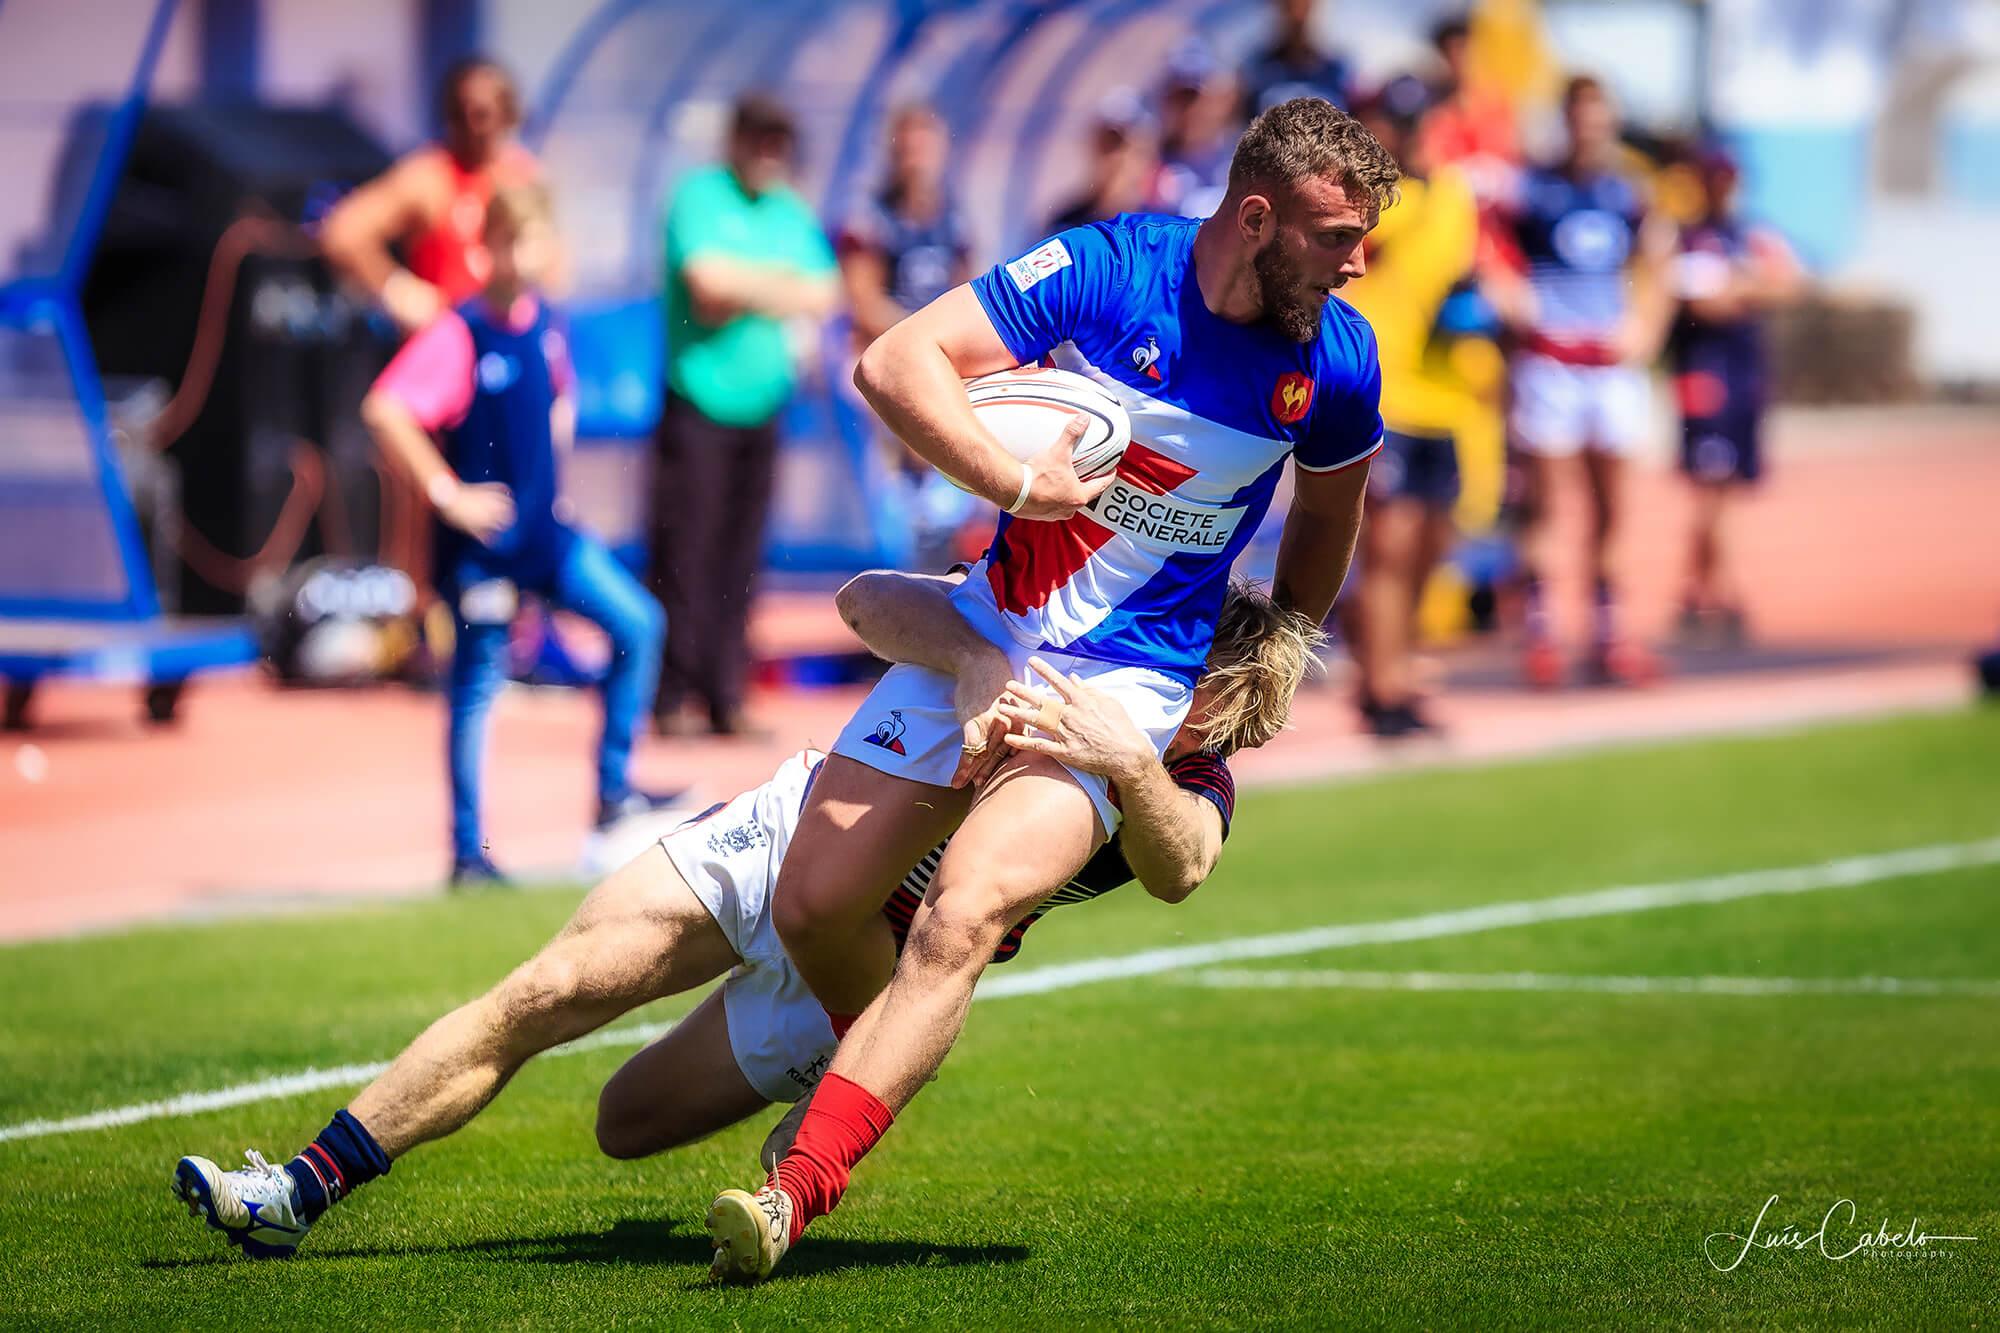 Algarve-7s-rugby-sevens-tournament-portugal-elite